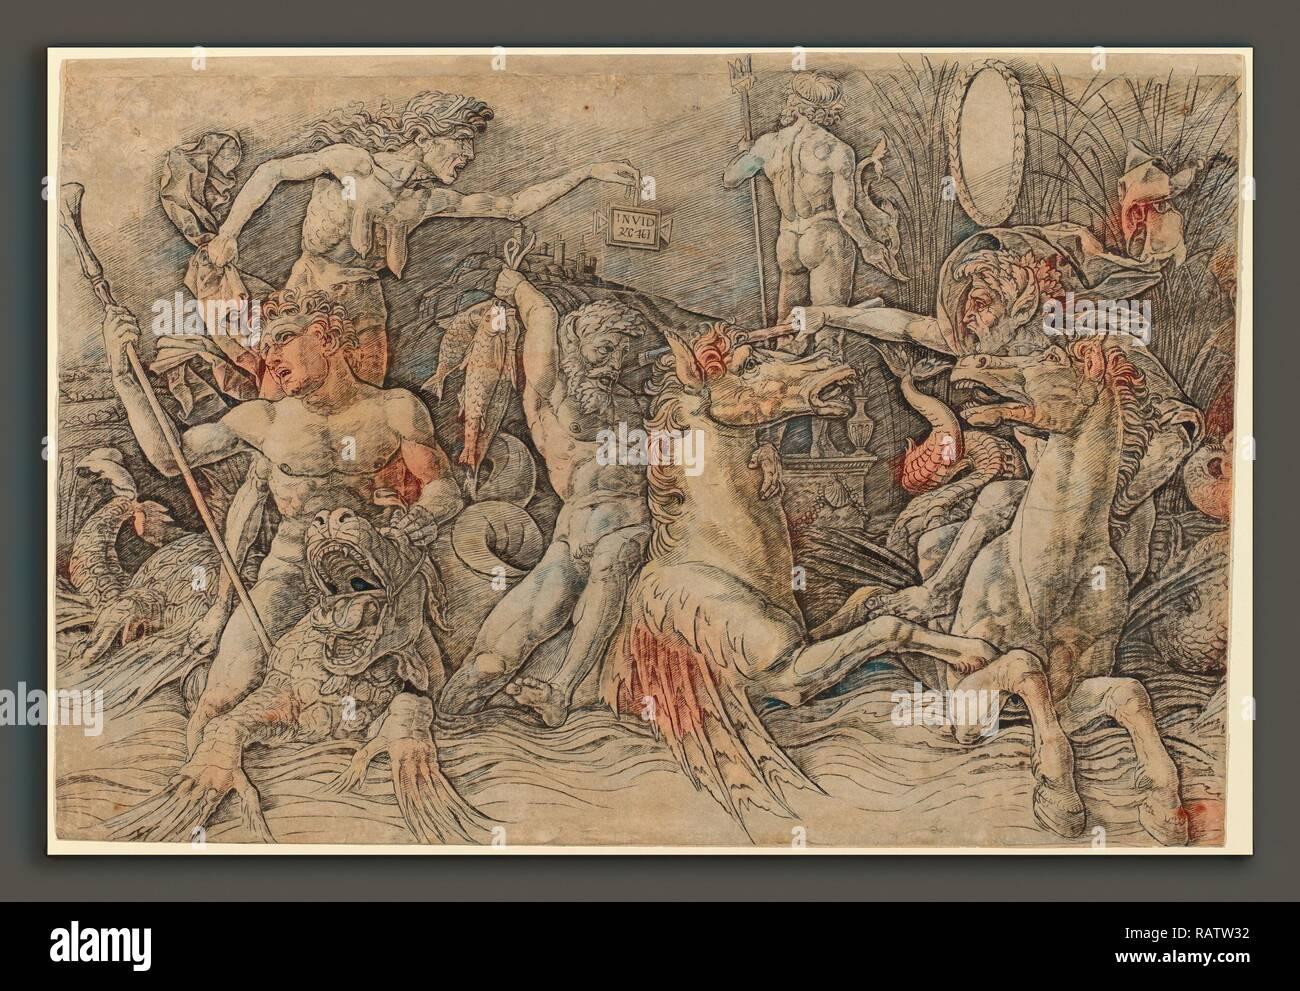 Andrea Mantegna (Italian, c. 1431 - 1506), Battle of the Sea Gods [left half], c. 1485-1488, engraving. Reimagined - Stock Image